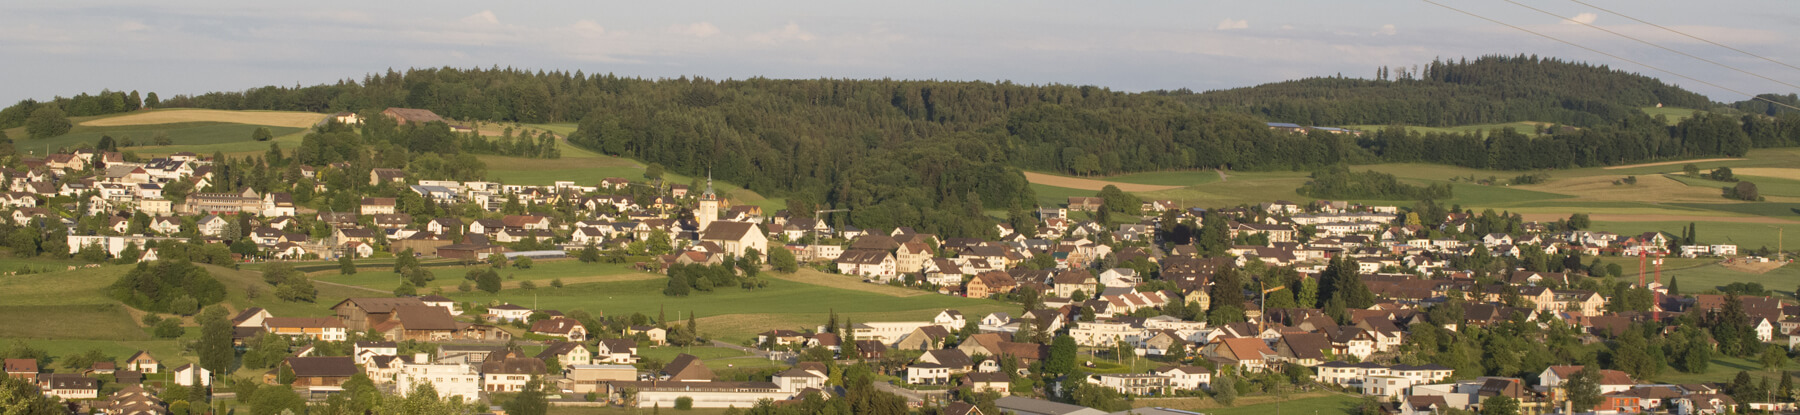 Panoramablick auf Sarmenstorf